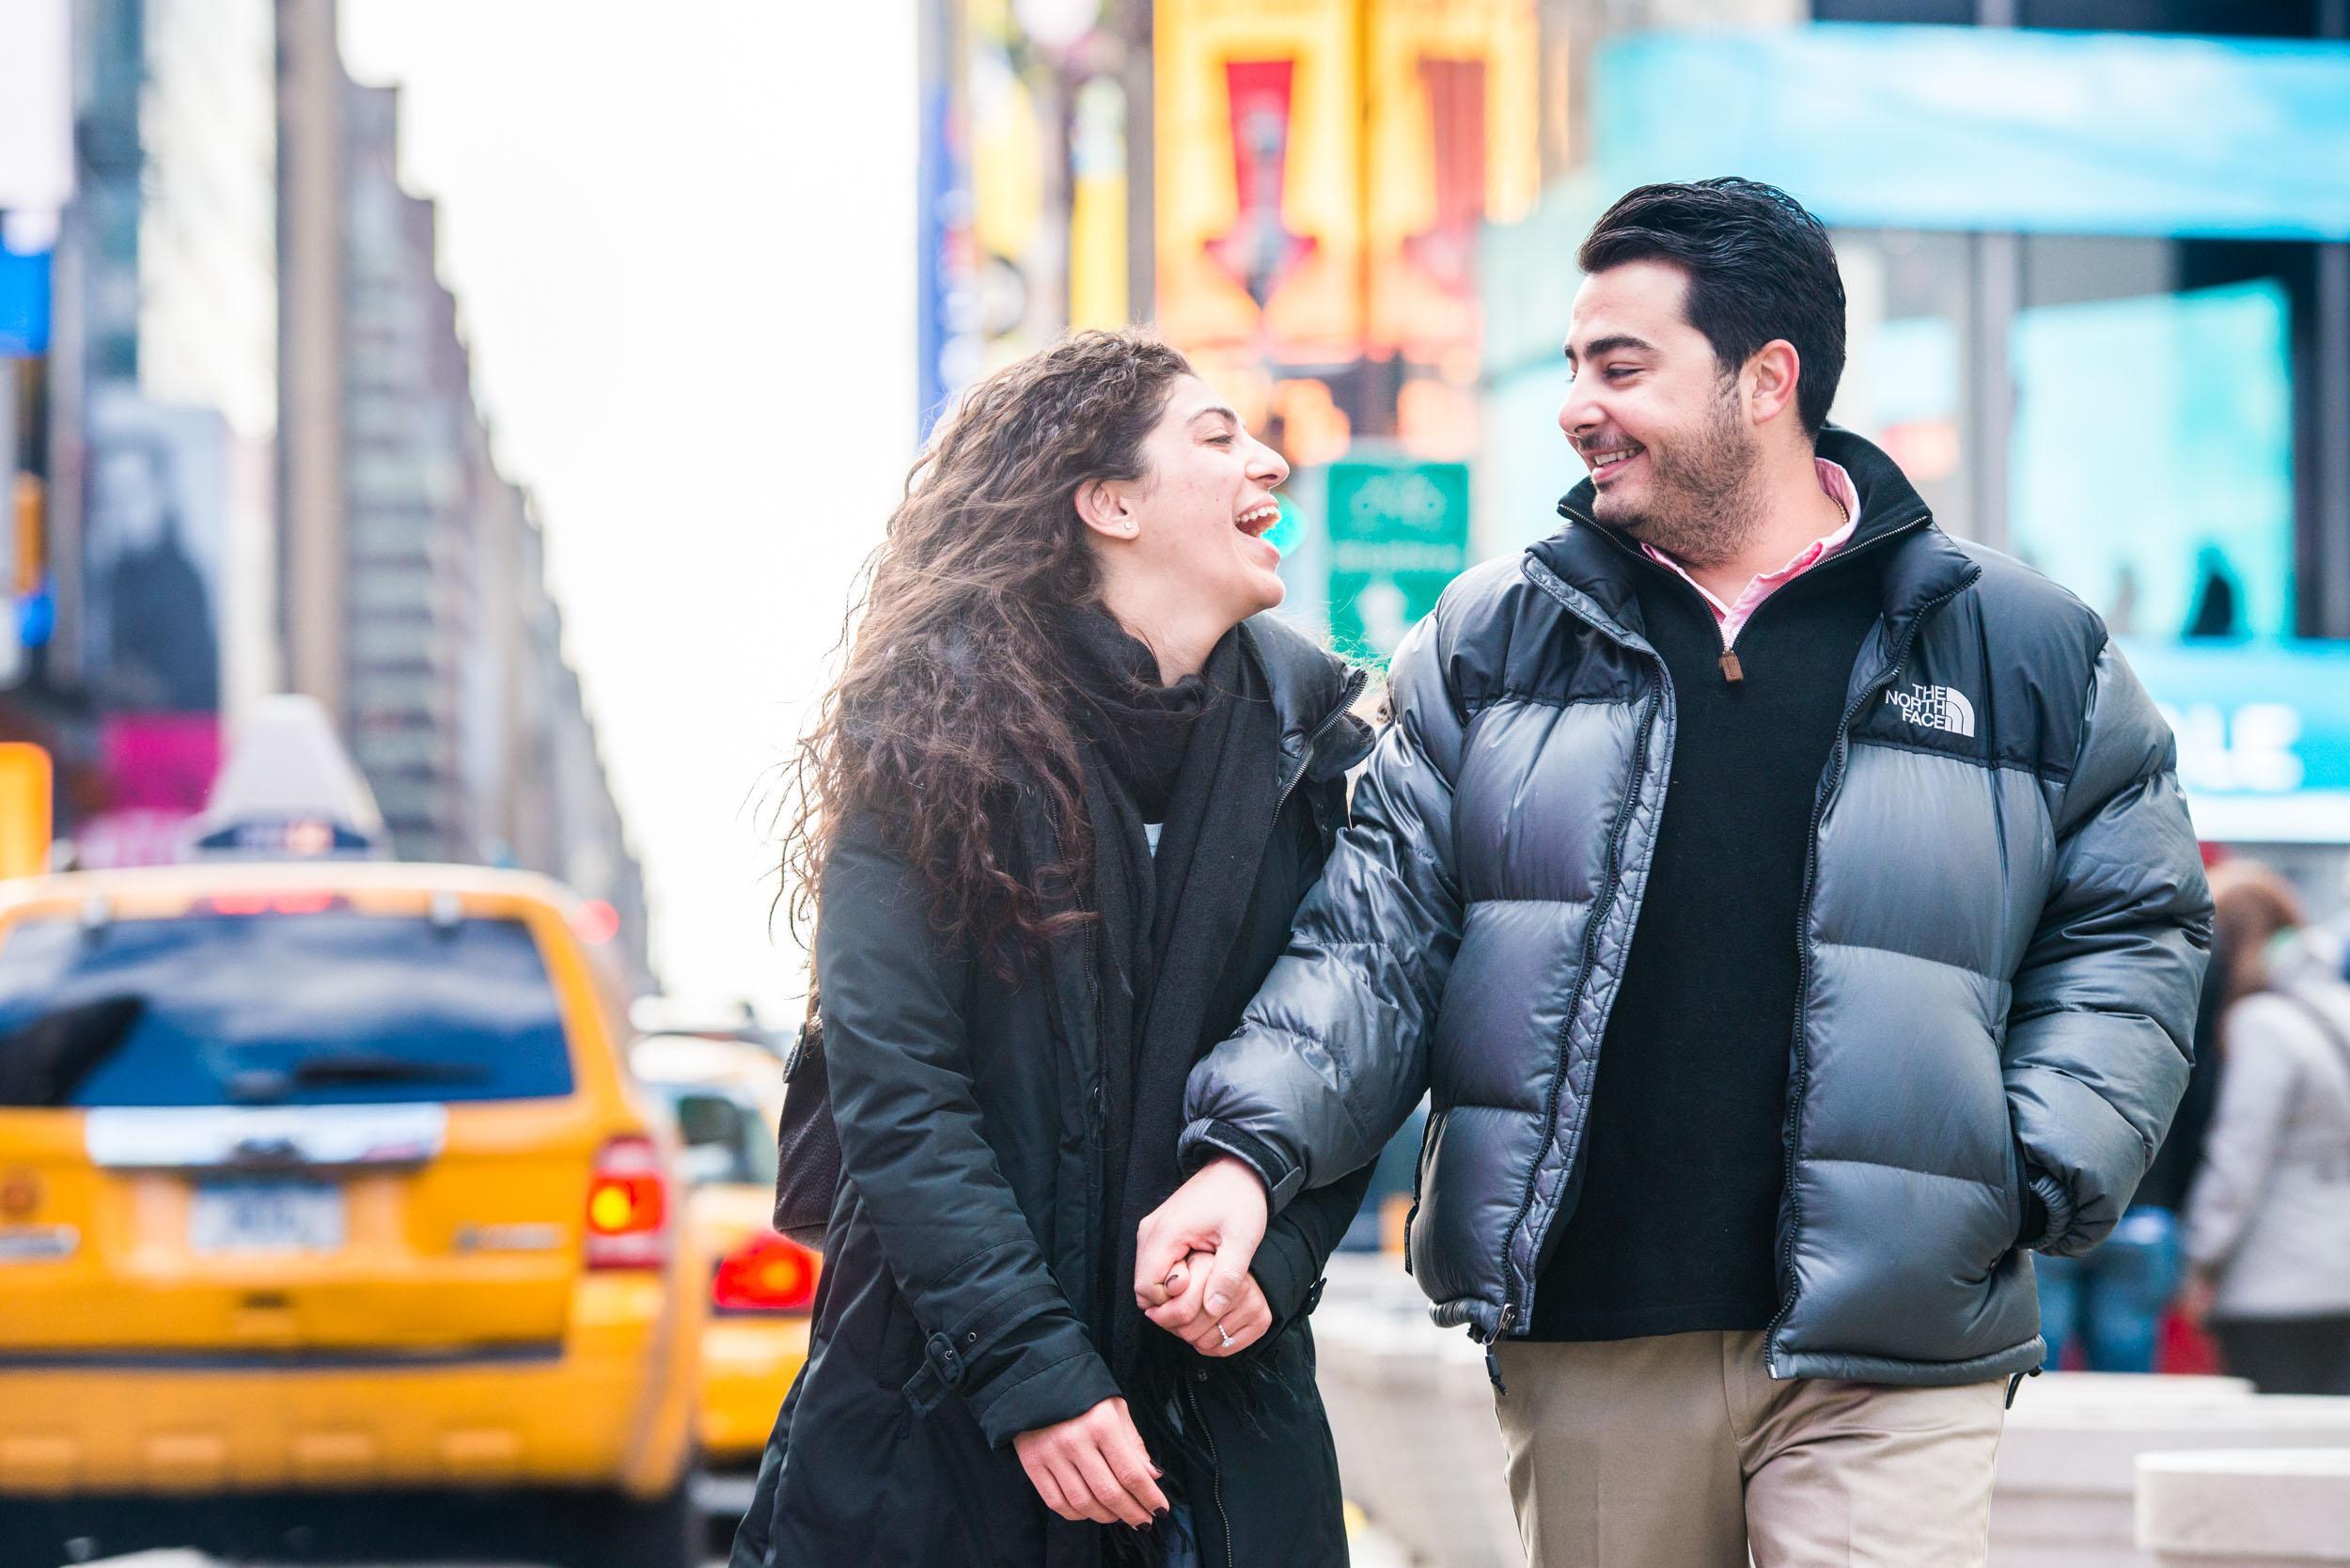 In NYC - Engagement Portraits - Photo credit Nicola Bailey.jpg